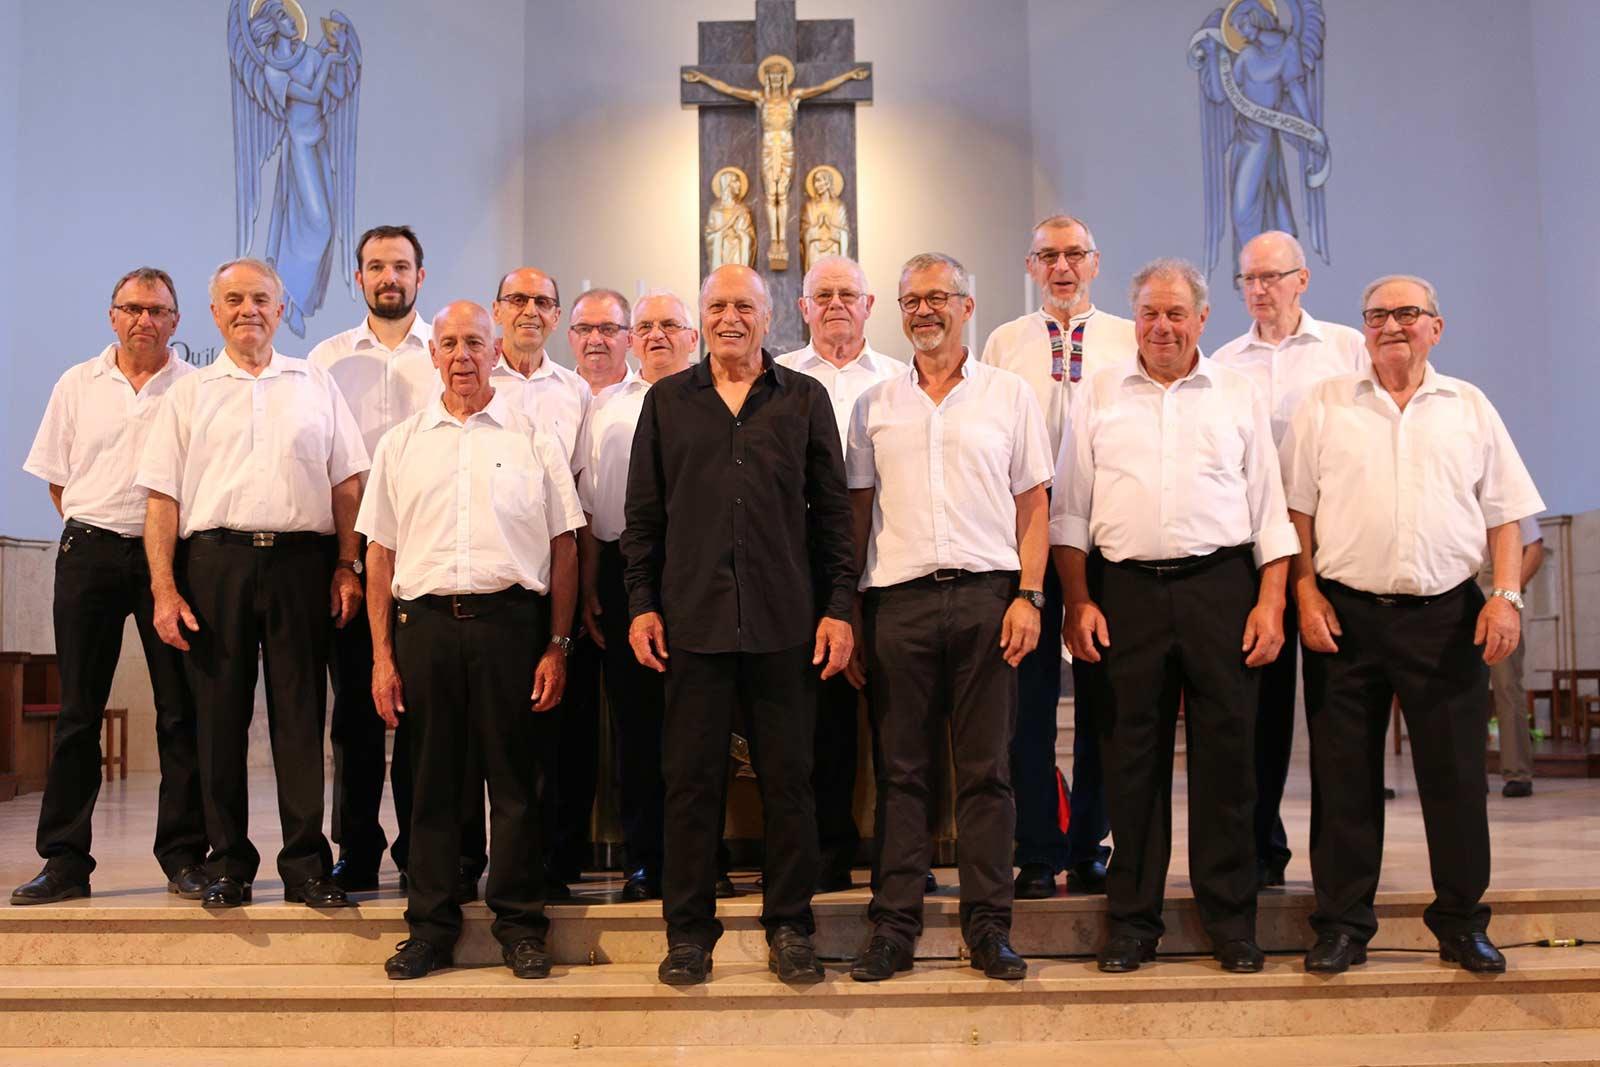 Concert de Noël, Niederbronn-les-Bains